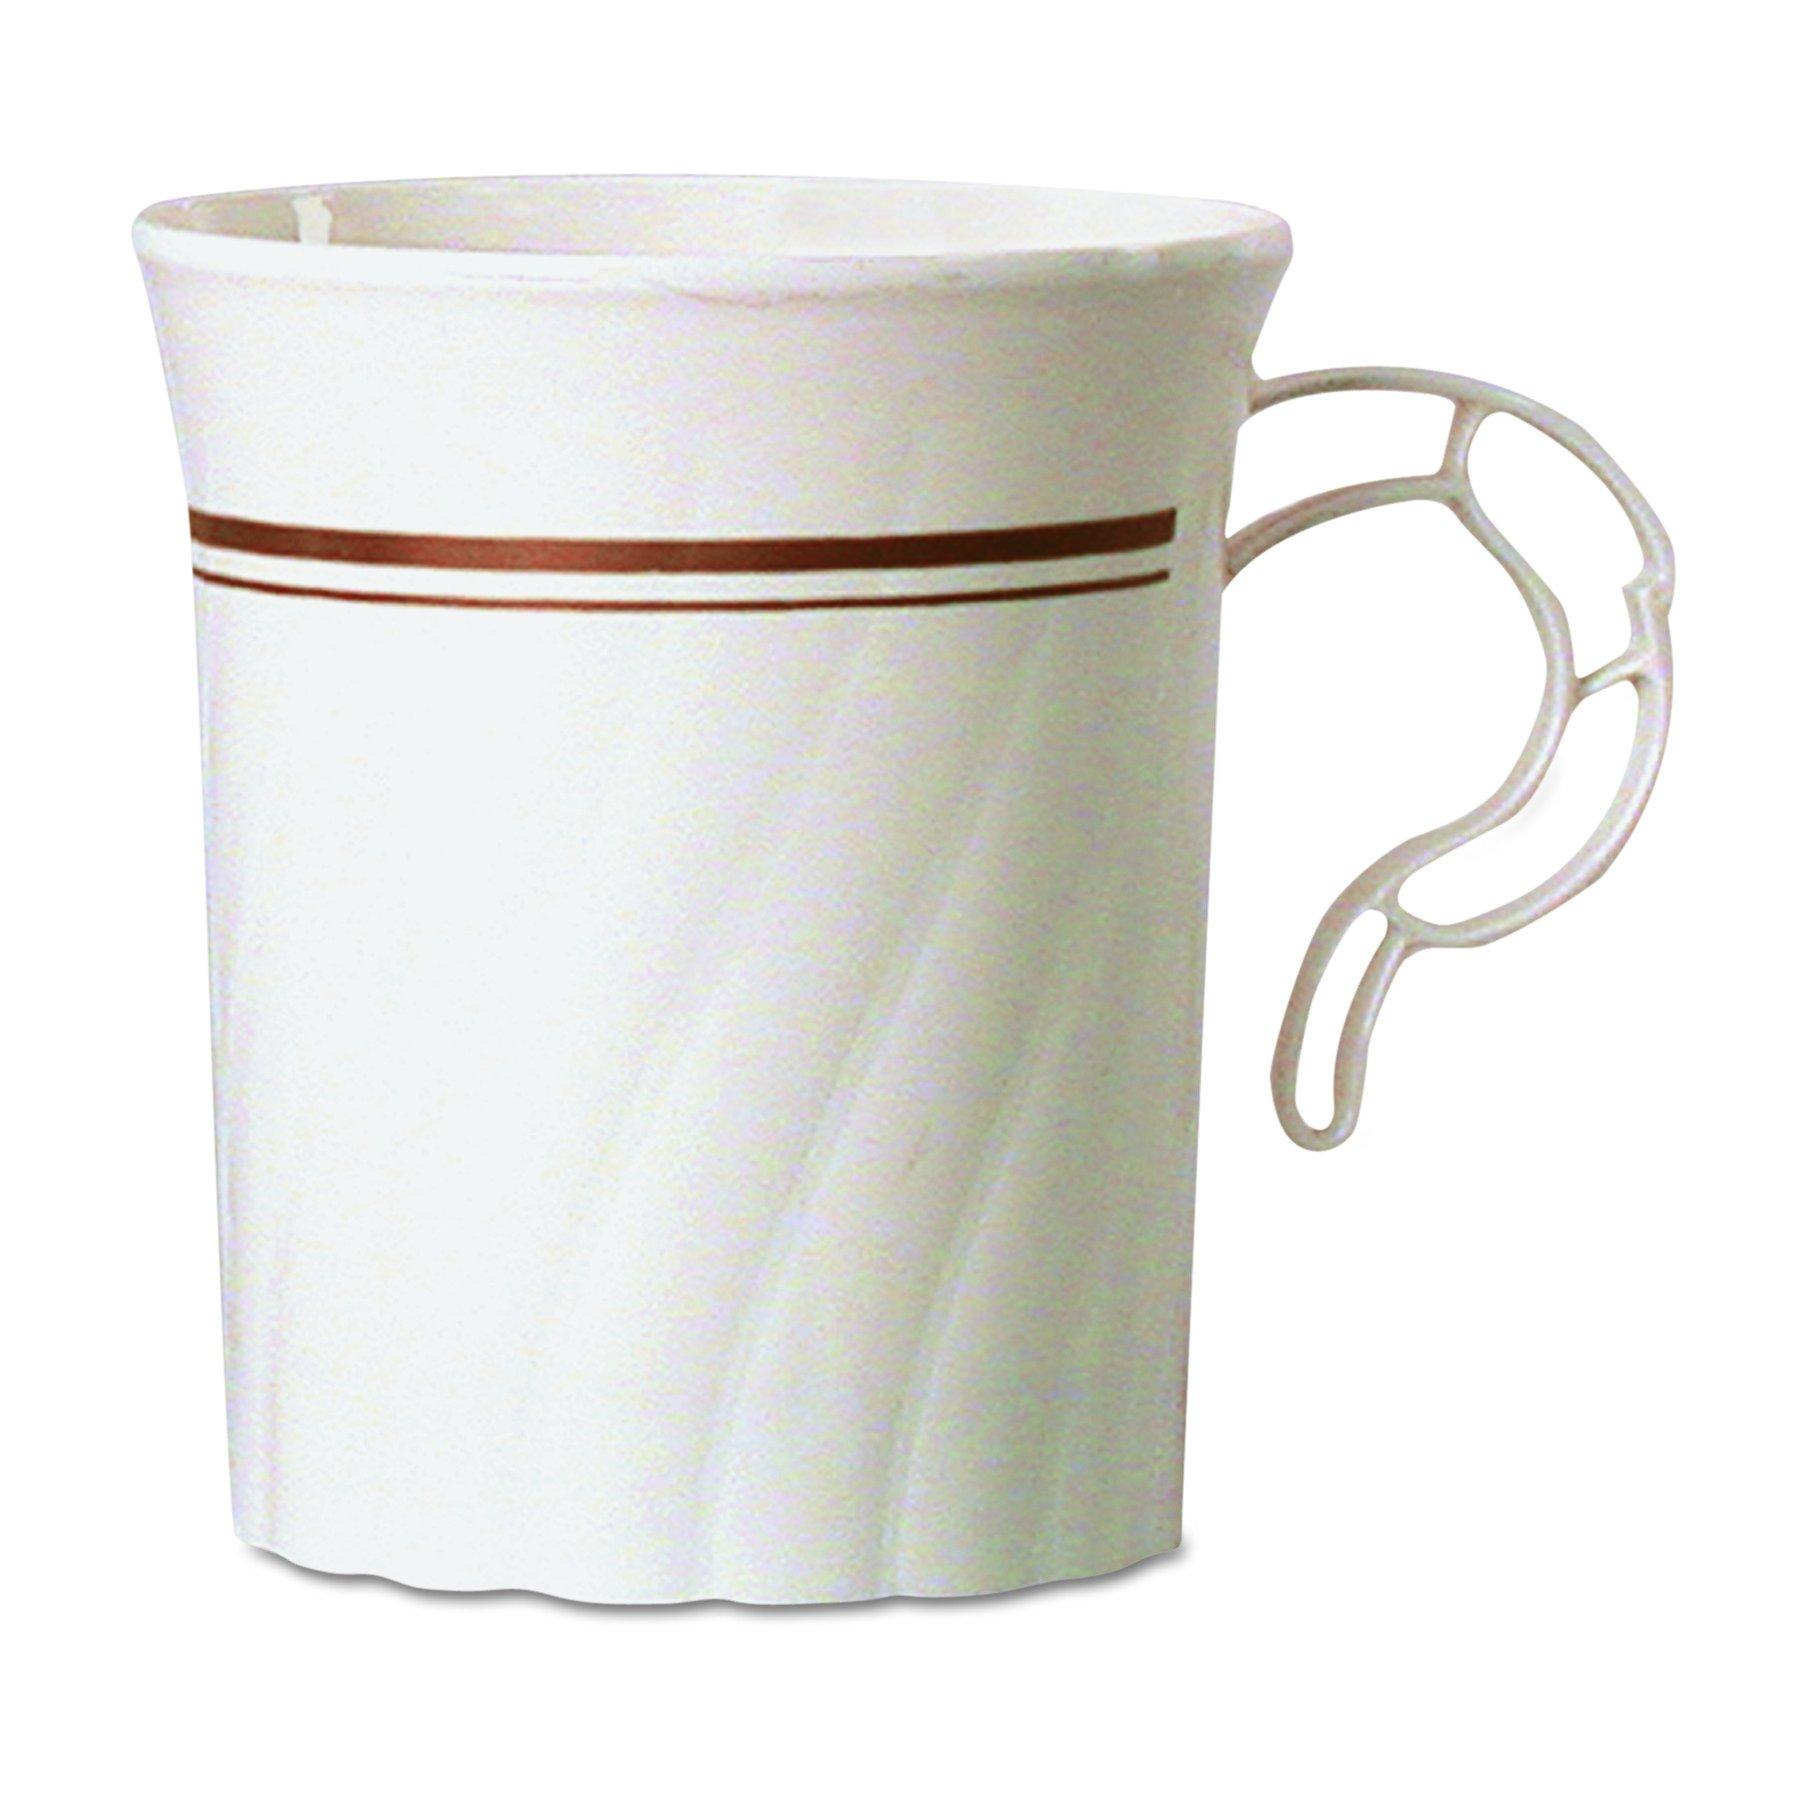 WNA CWM8192IPREM Masterpiece Plastic Mugs, 8 oz., Ivory with Gold Print (Case of 192)